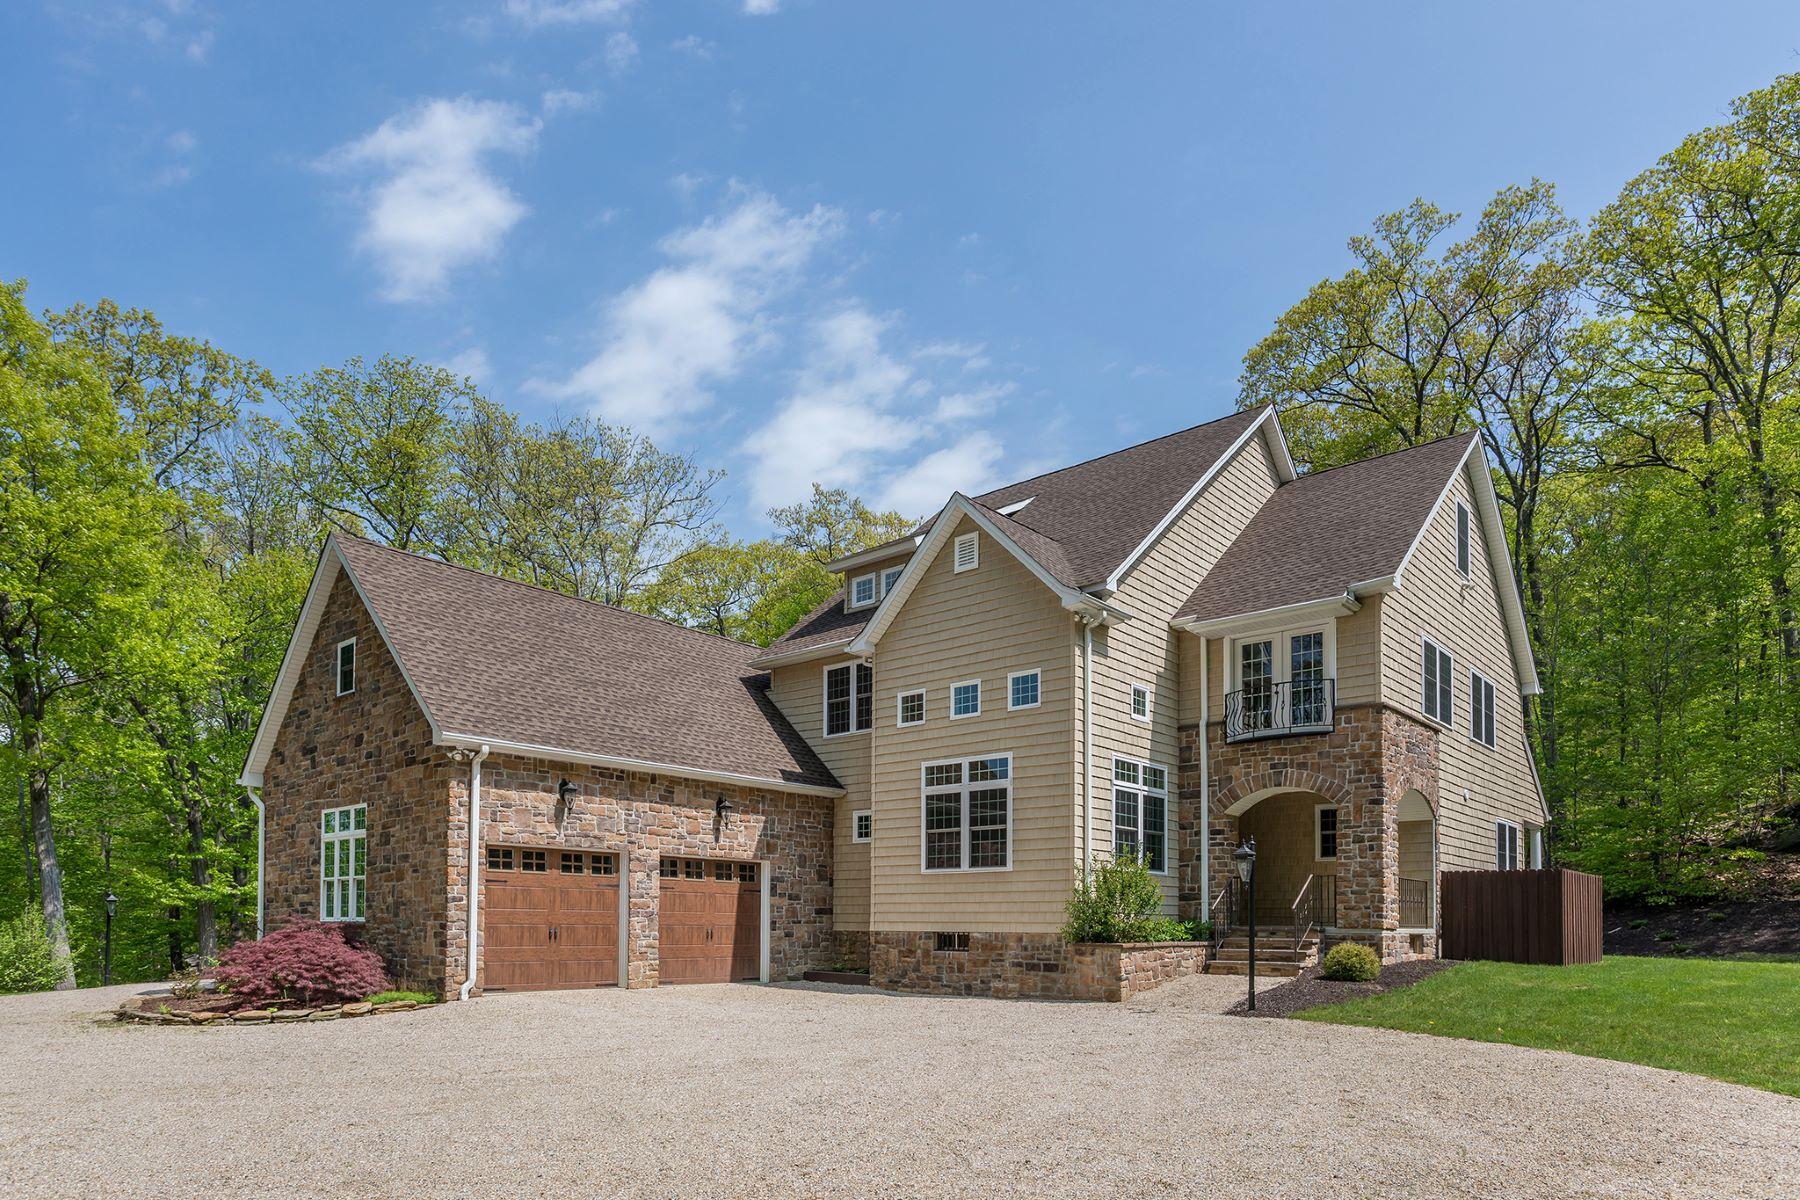 Casa Unifamiliar por un Venta en 102 Whittlesey Road 102 Whittlesey Road Woodbury, Connecticut 06798 Estados Unidos